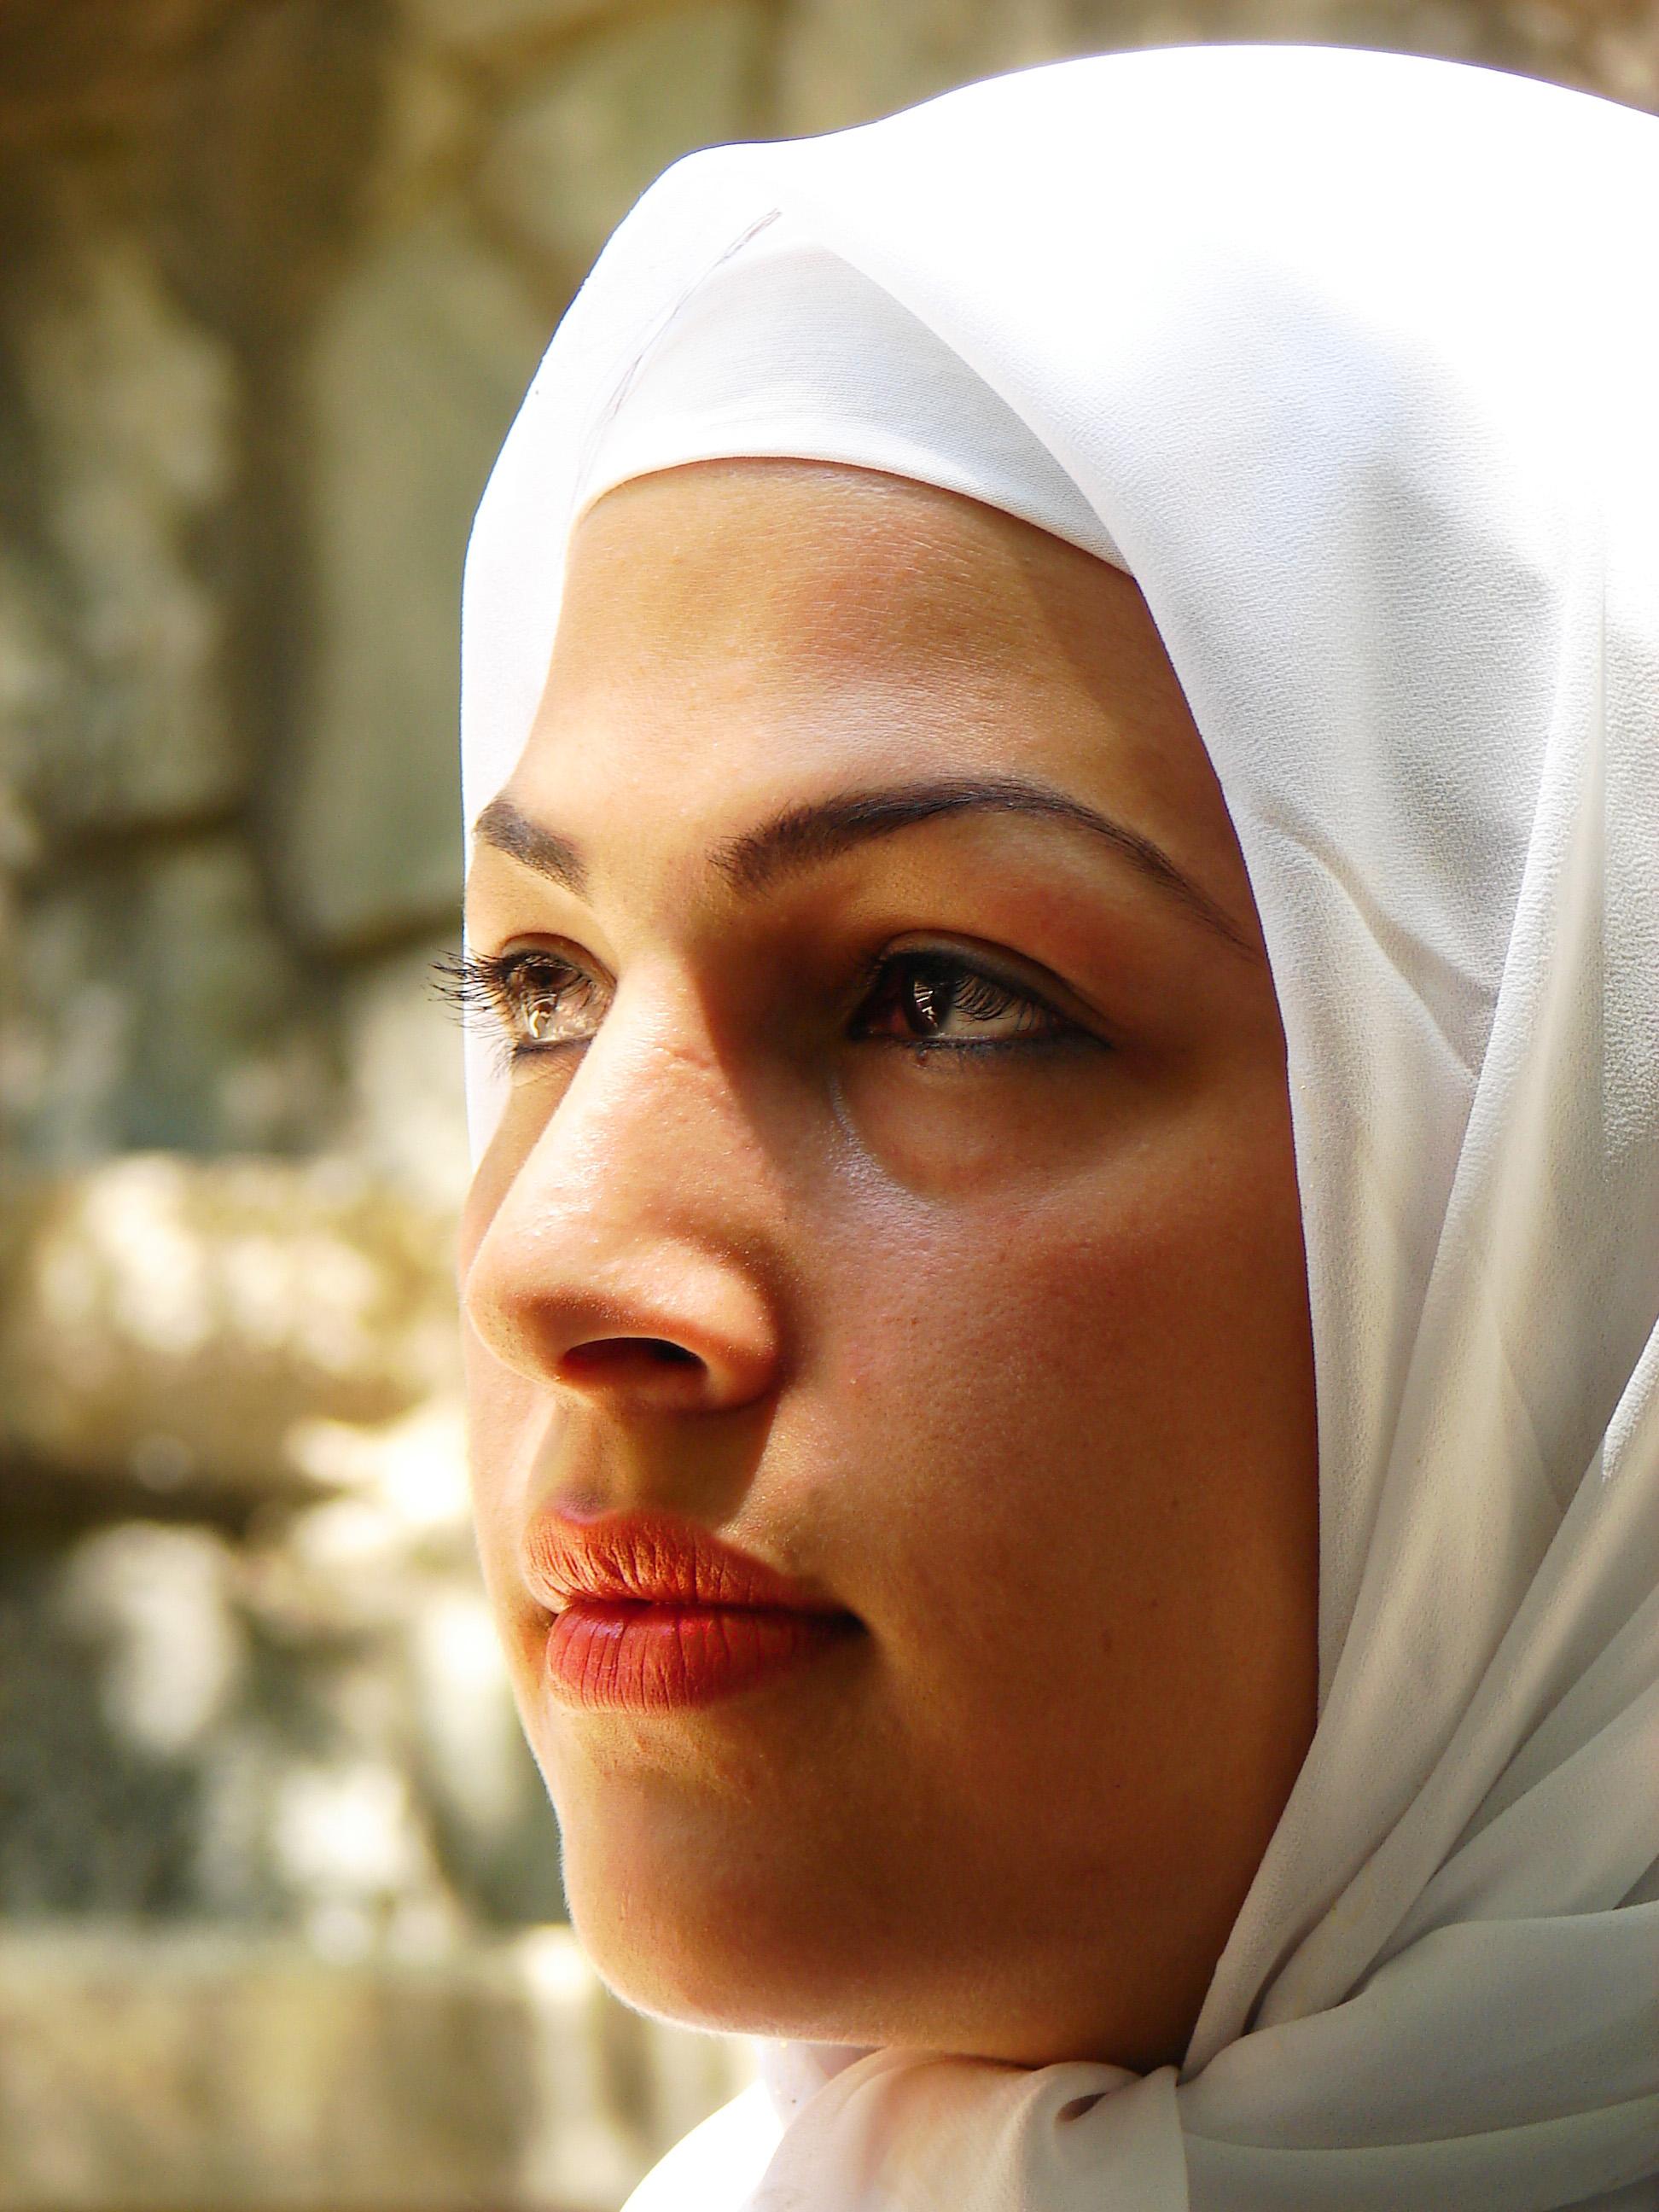 File:Iranian women - white scarf.jpg